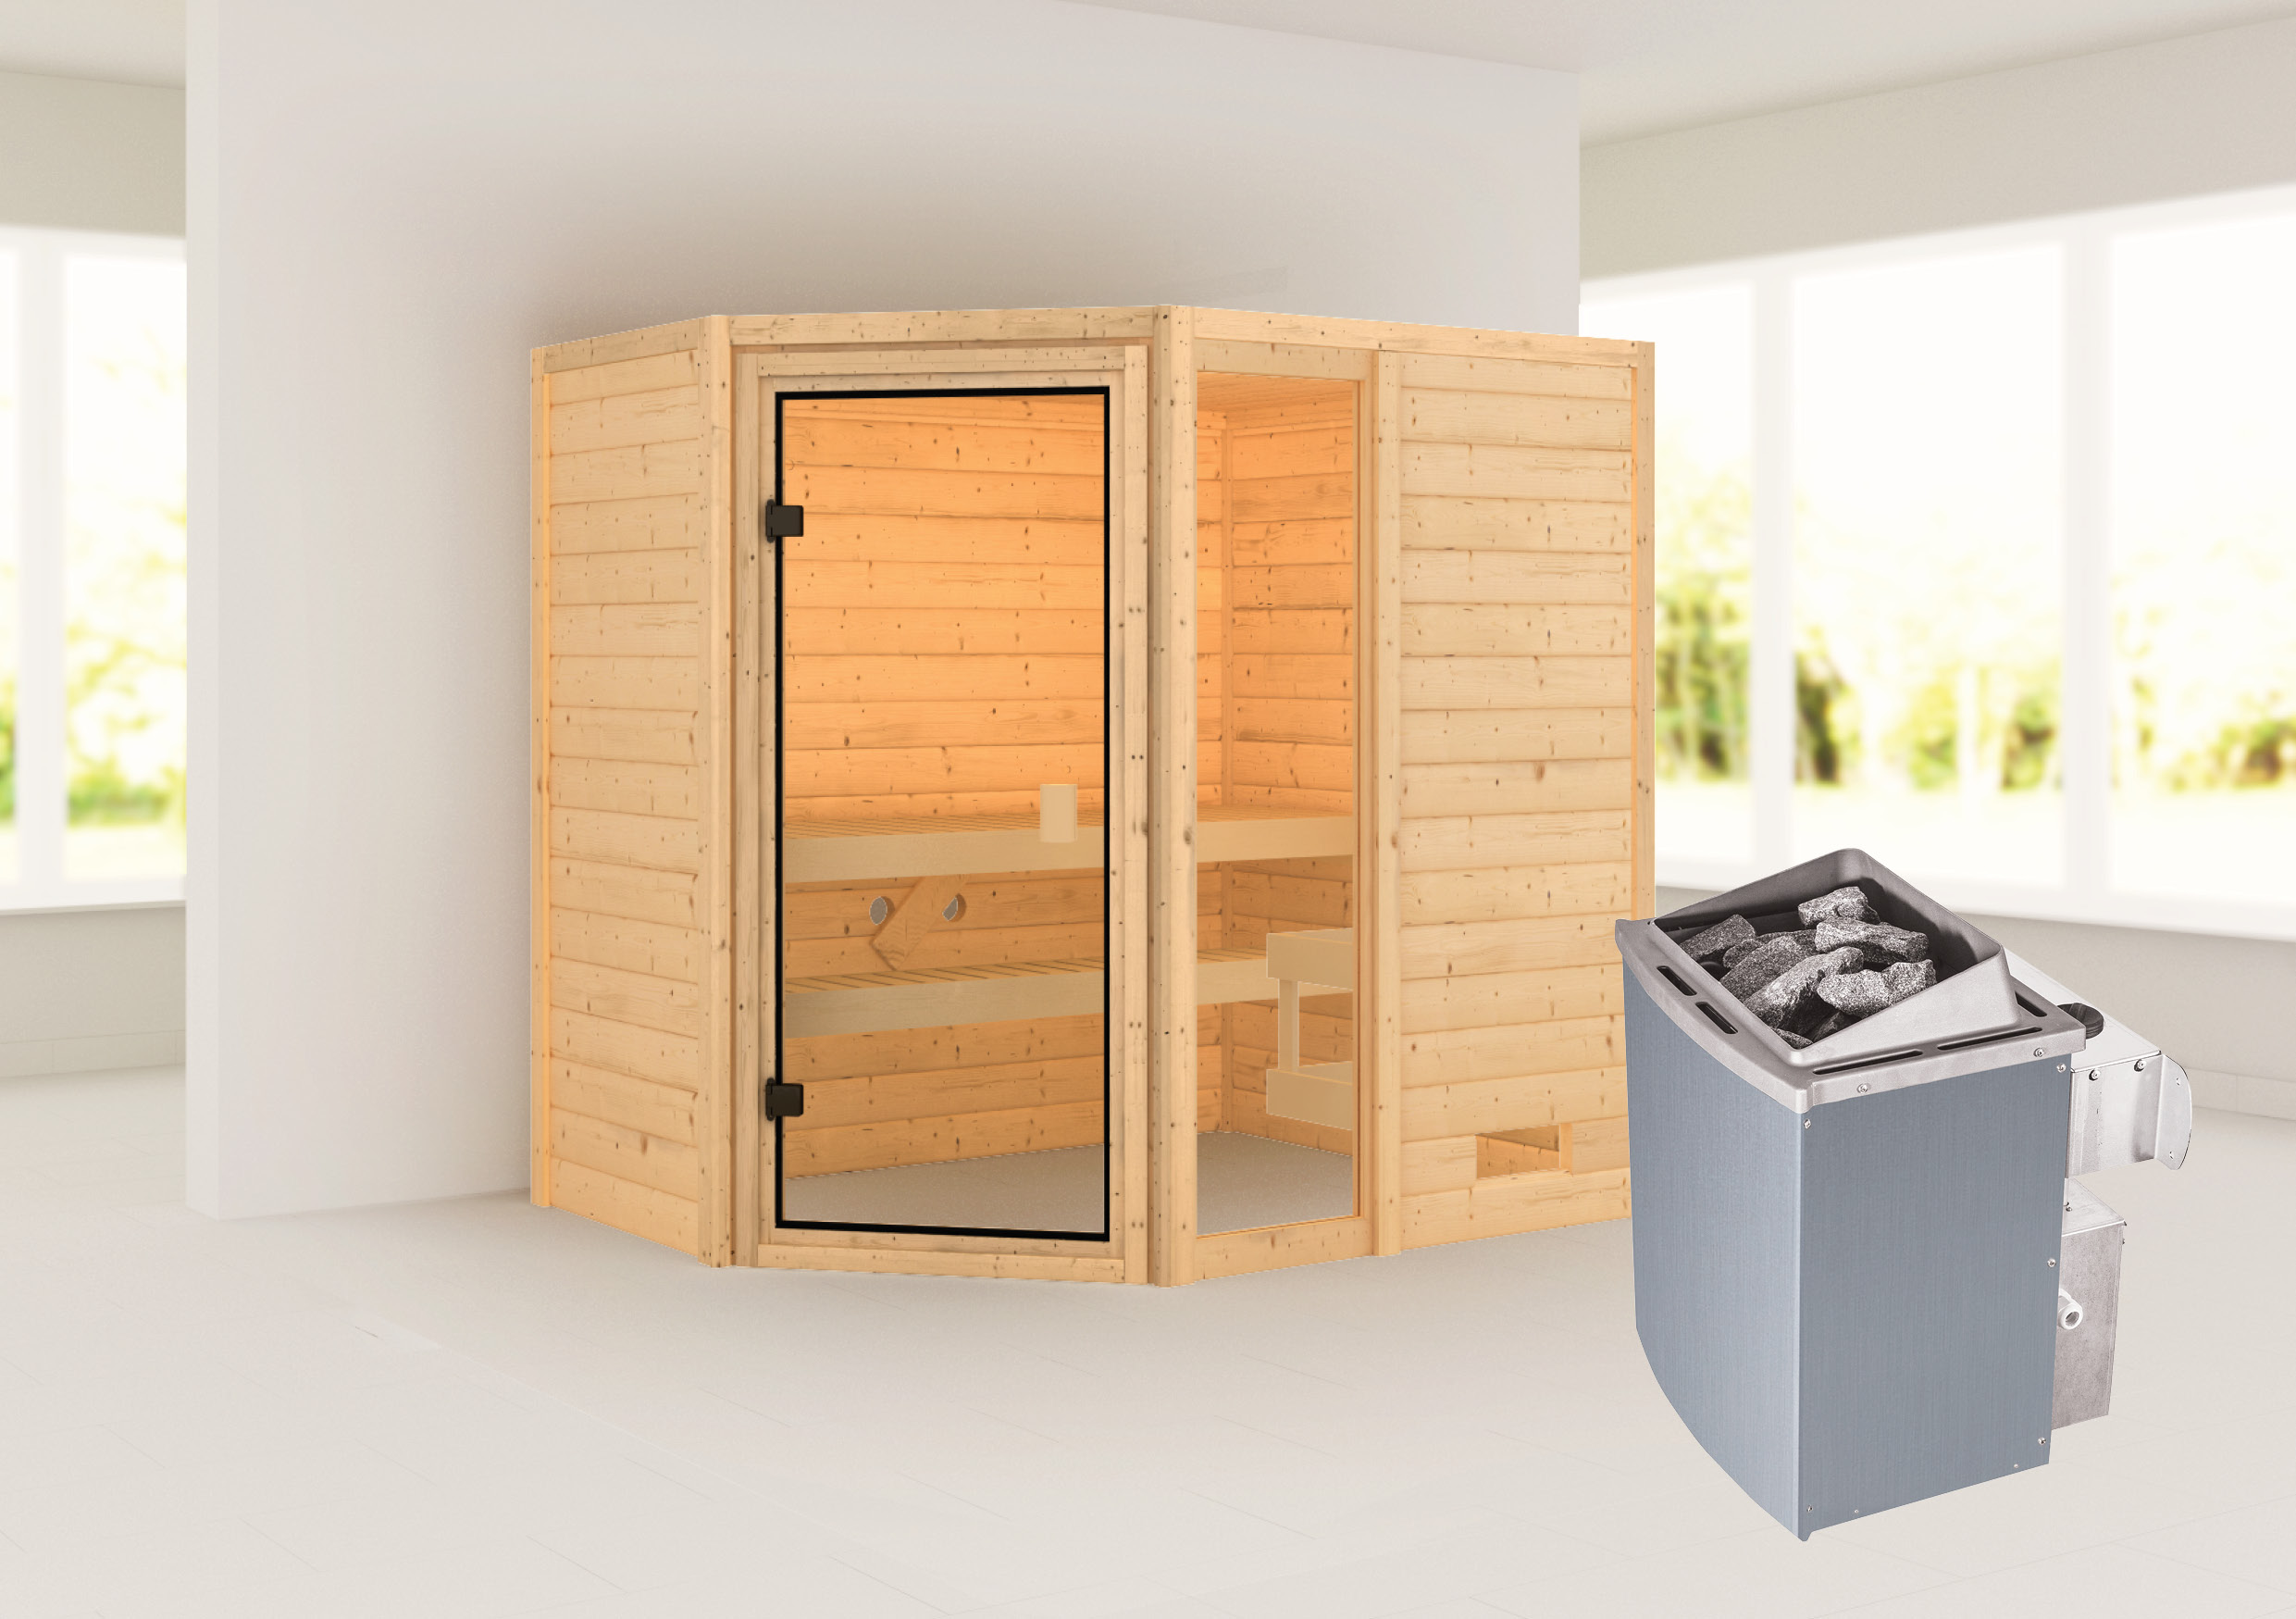 Woodfeeling Sauna Jada 38mm Saunaofen 9 kW intern Bild 1